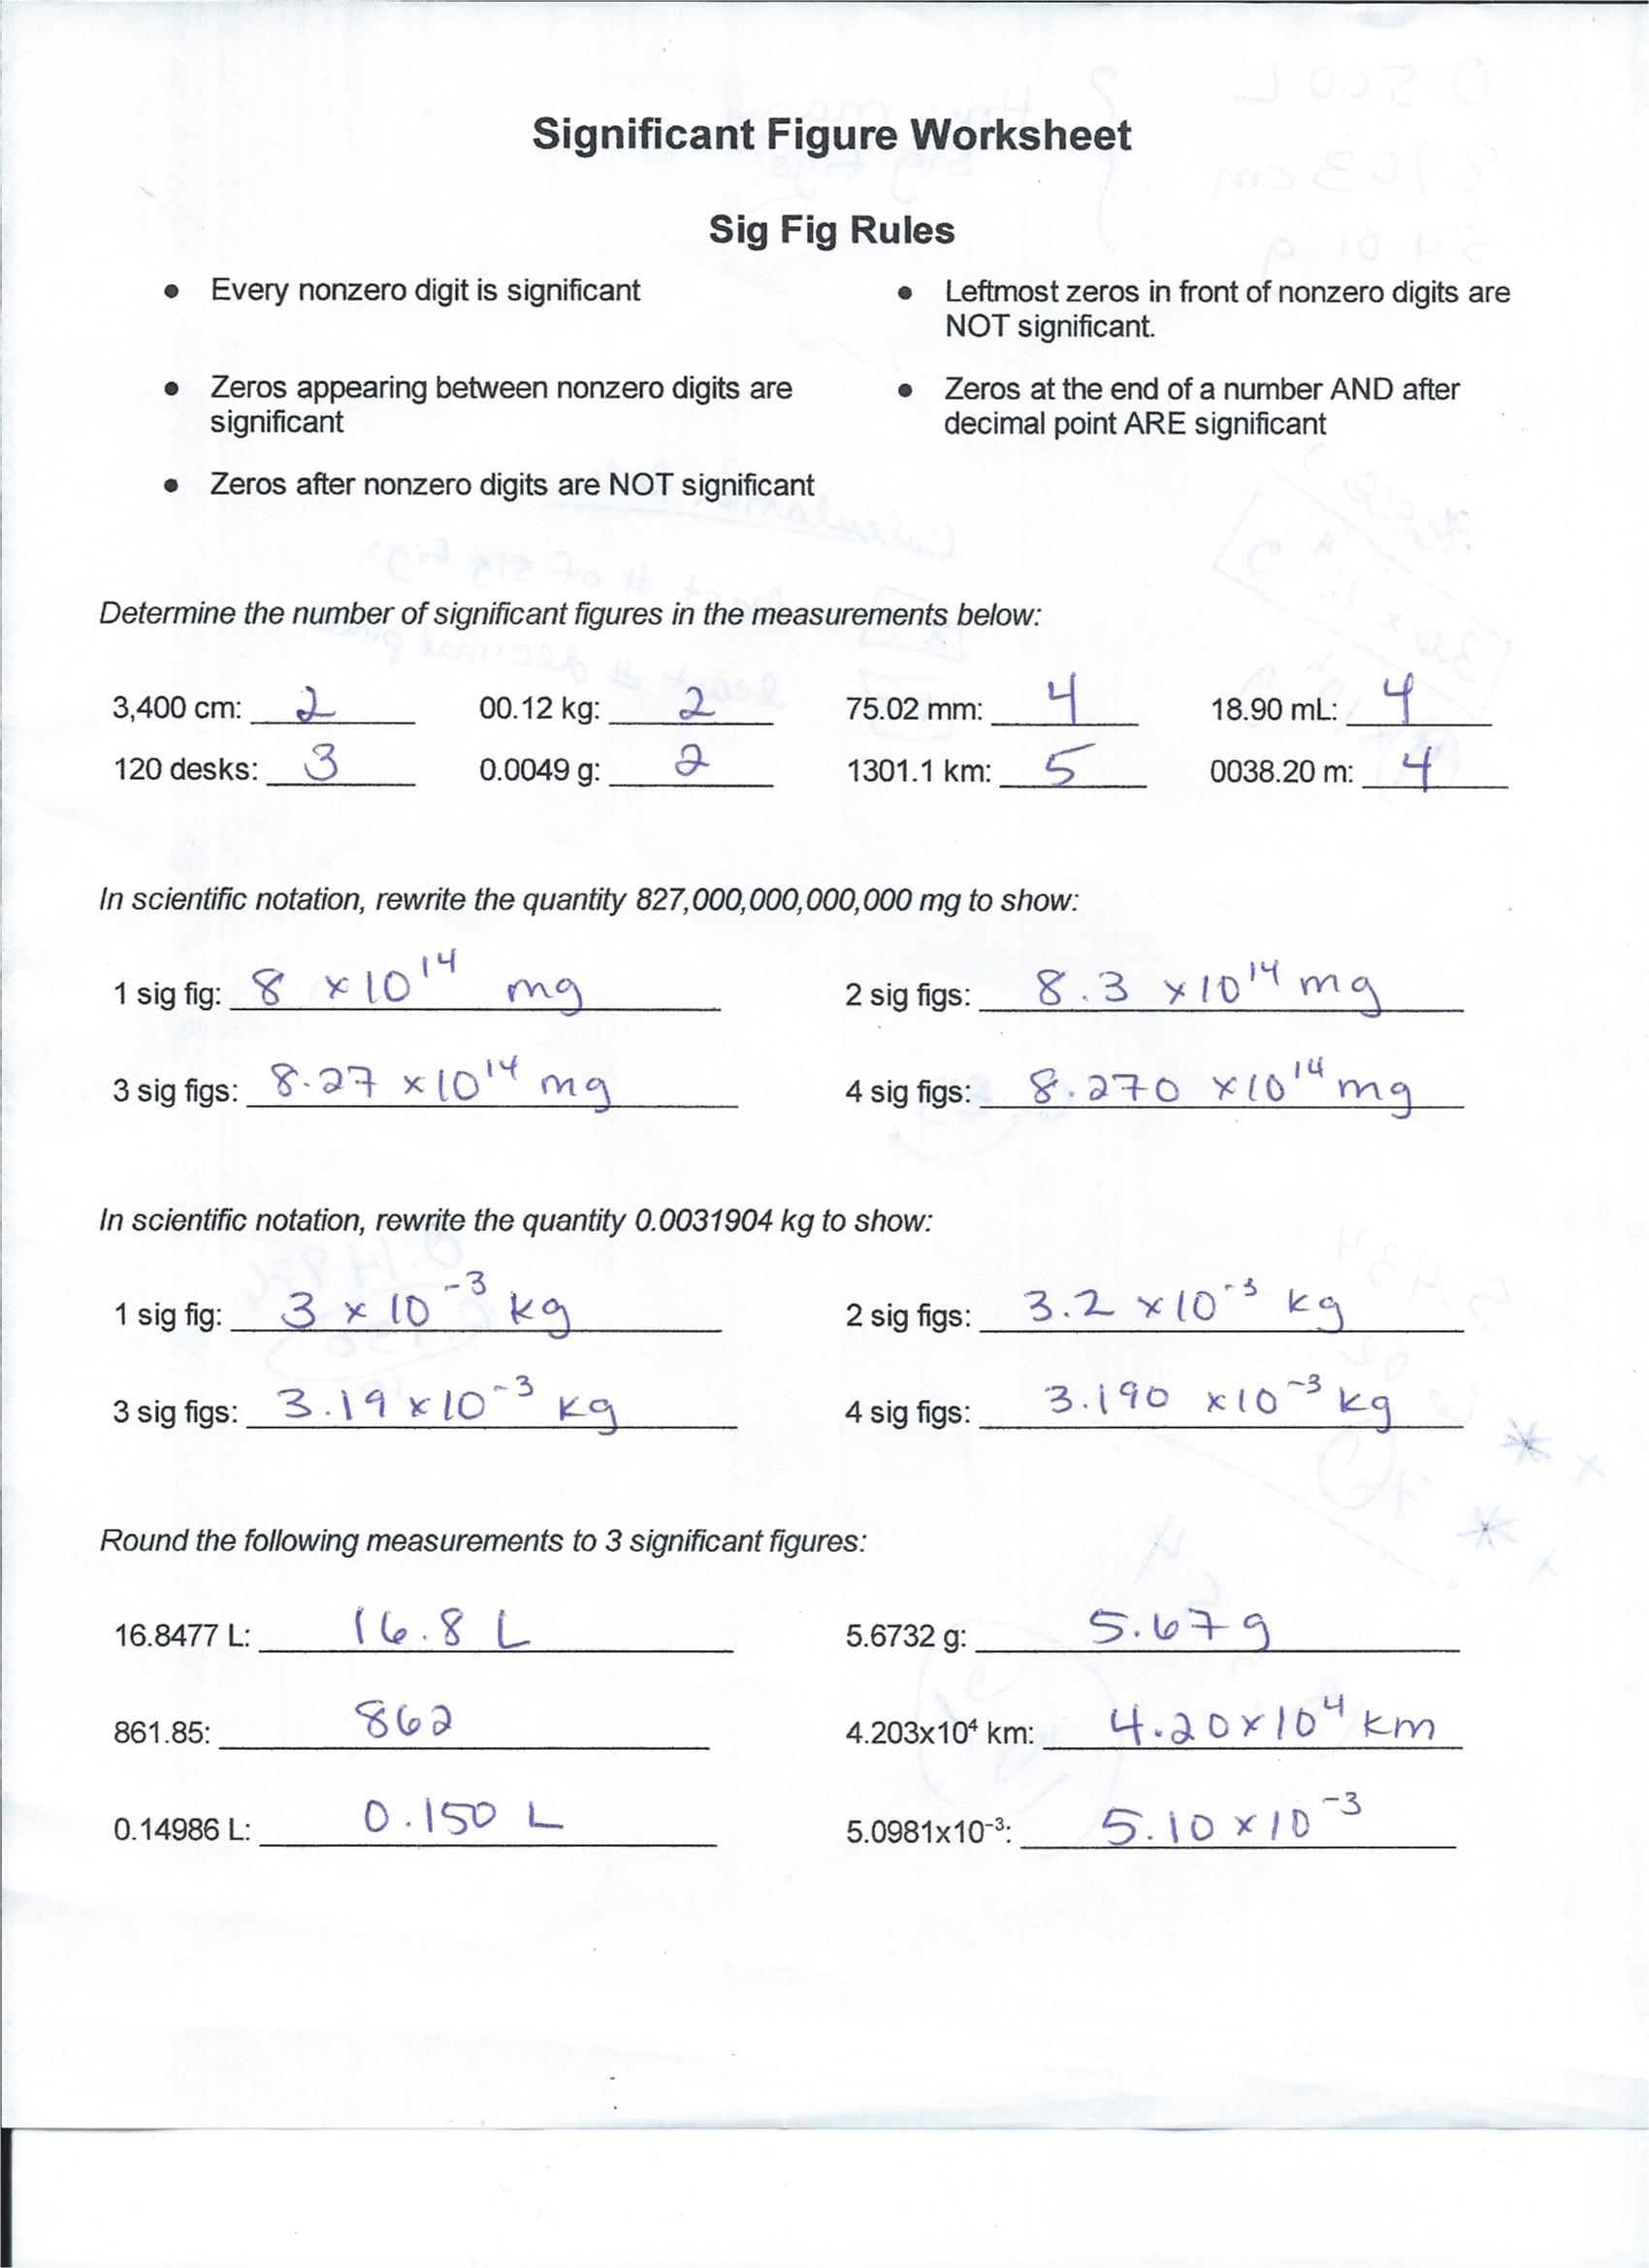 Scientific Notation Worksheet Answer Key Go Figure Chemistry Worksheet Answers